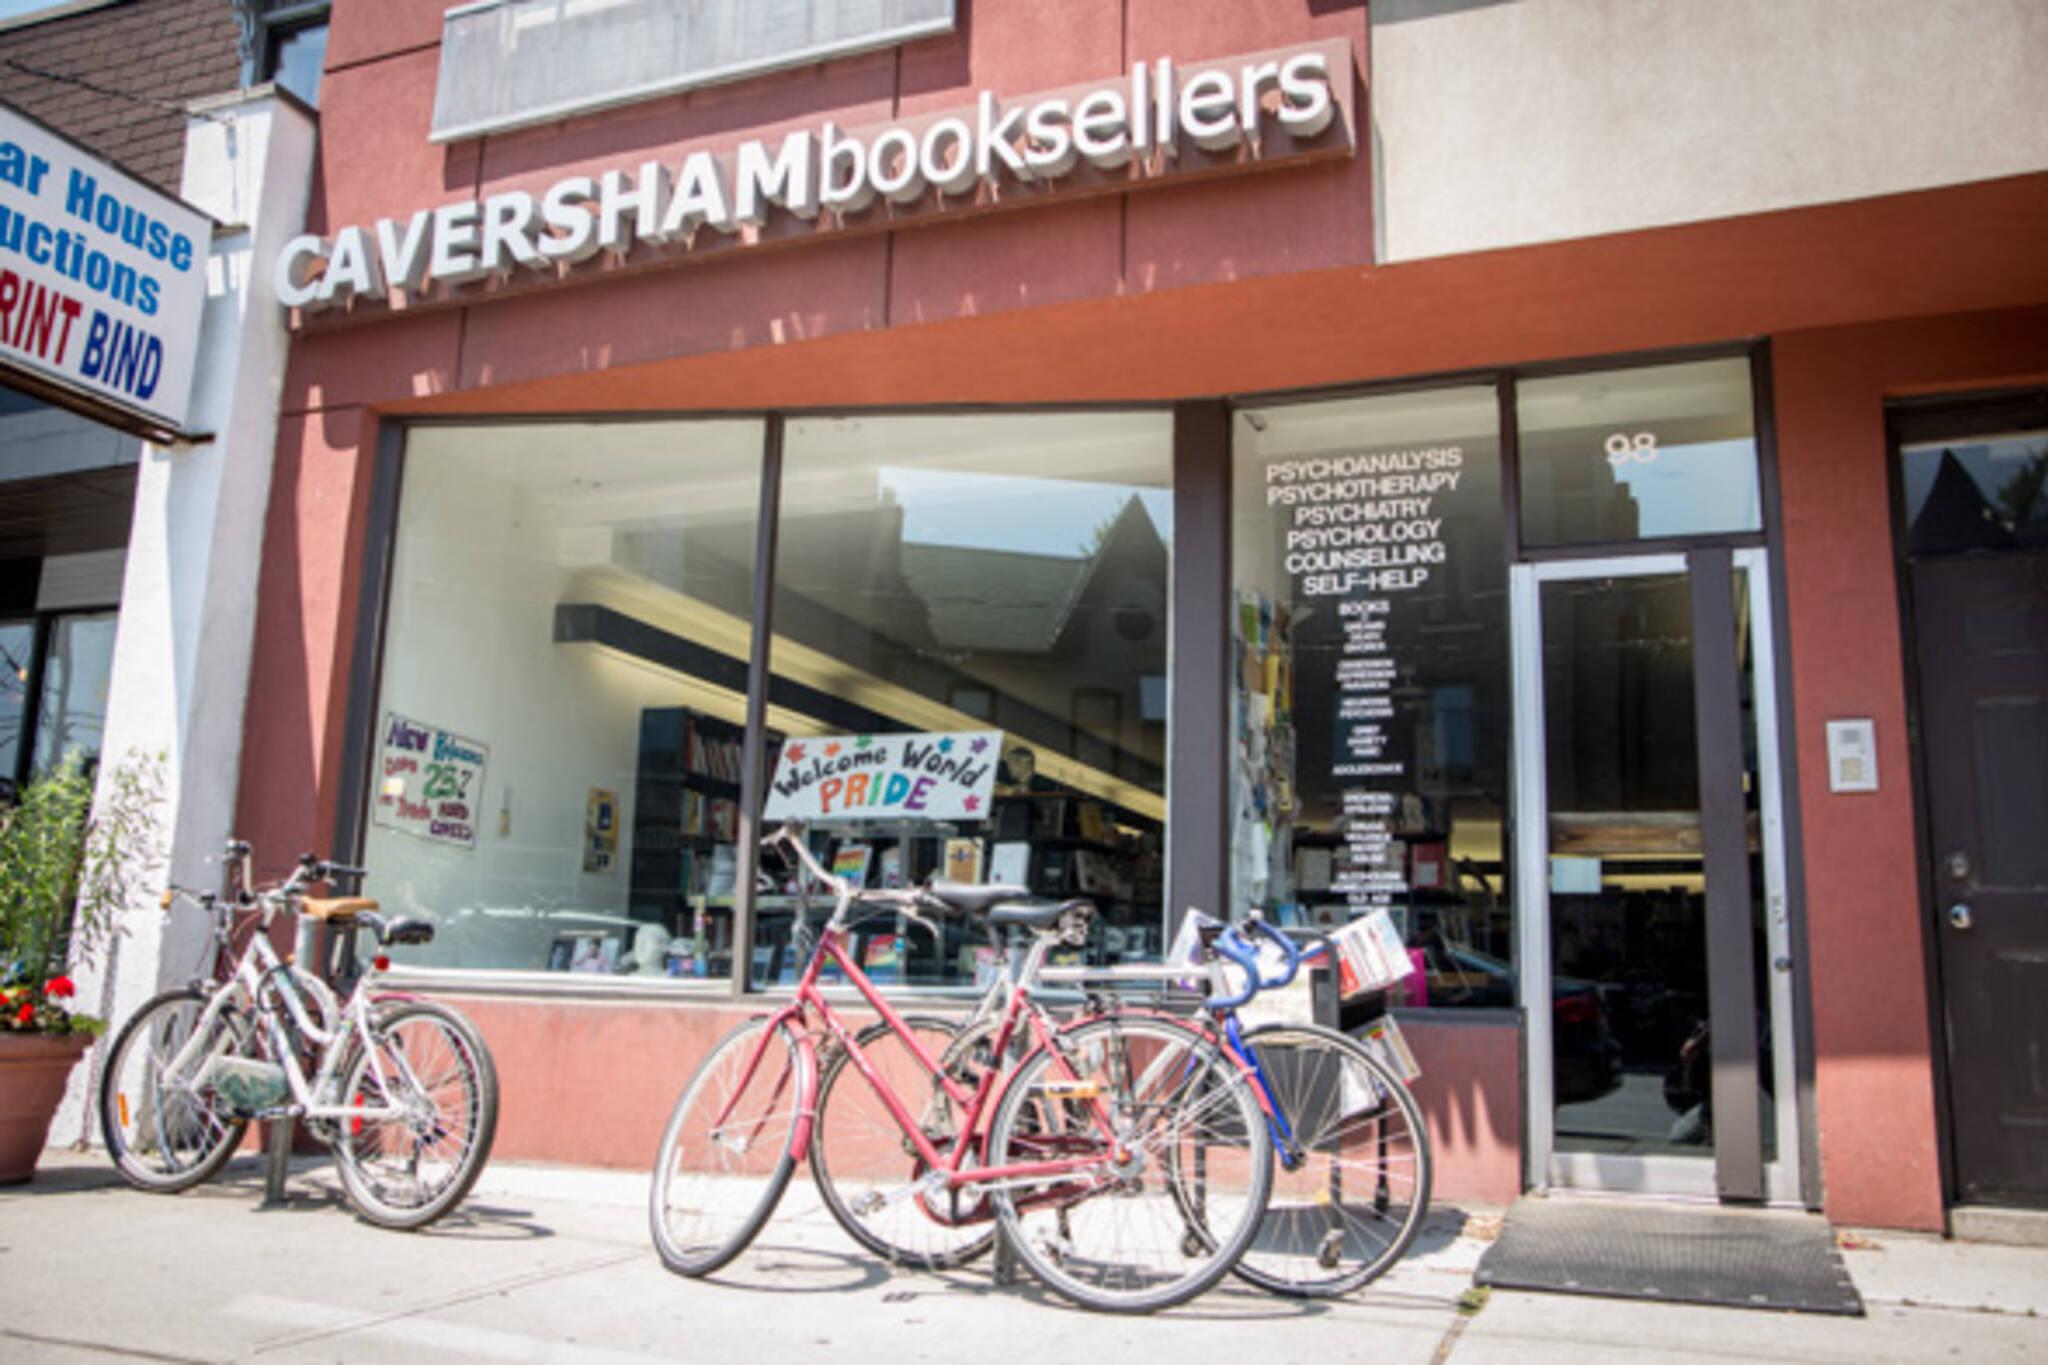 caversham booksellers toronto